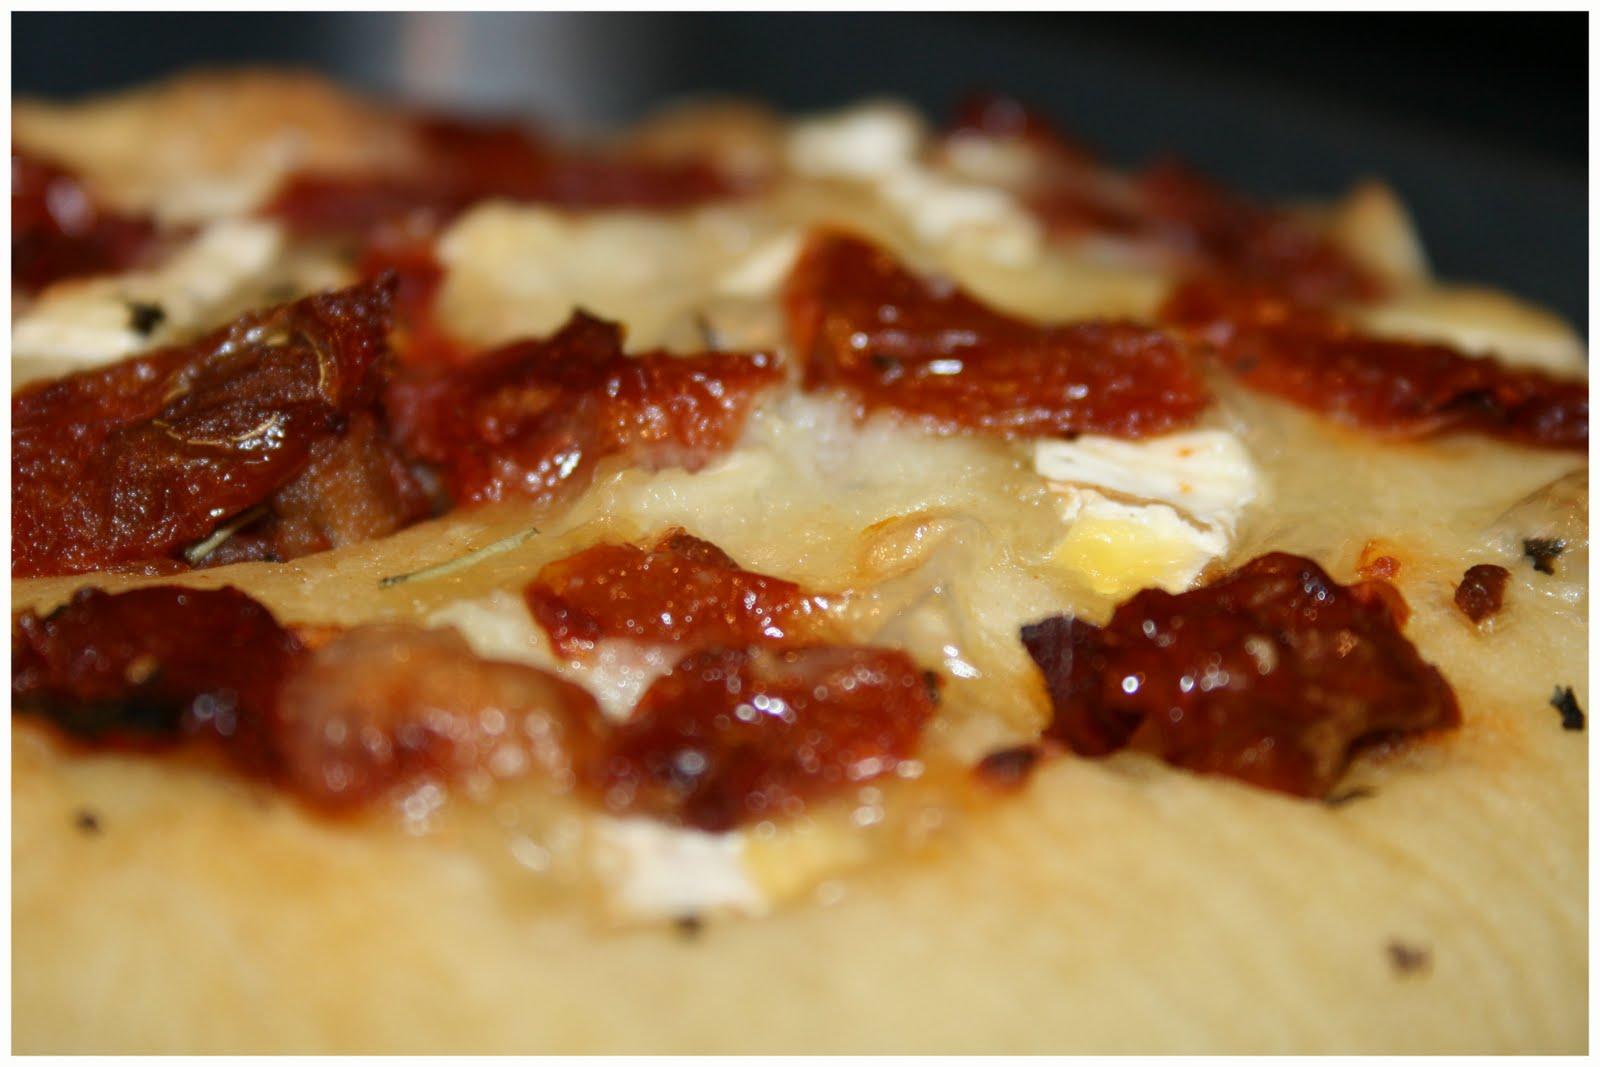 Le pain italien la focaccia for L internaute cuisiner